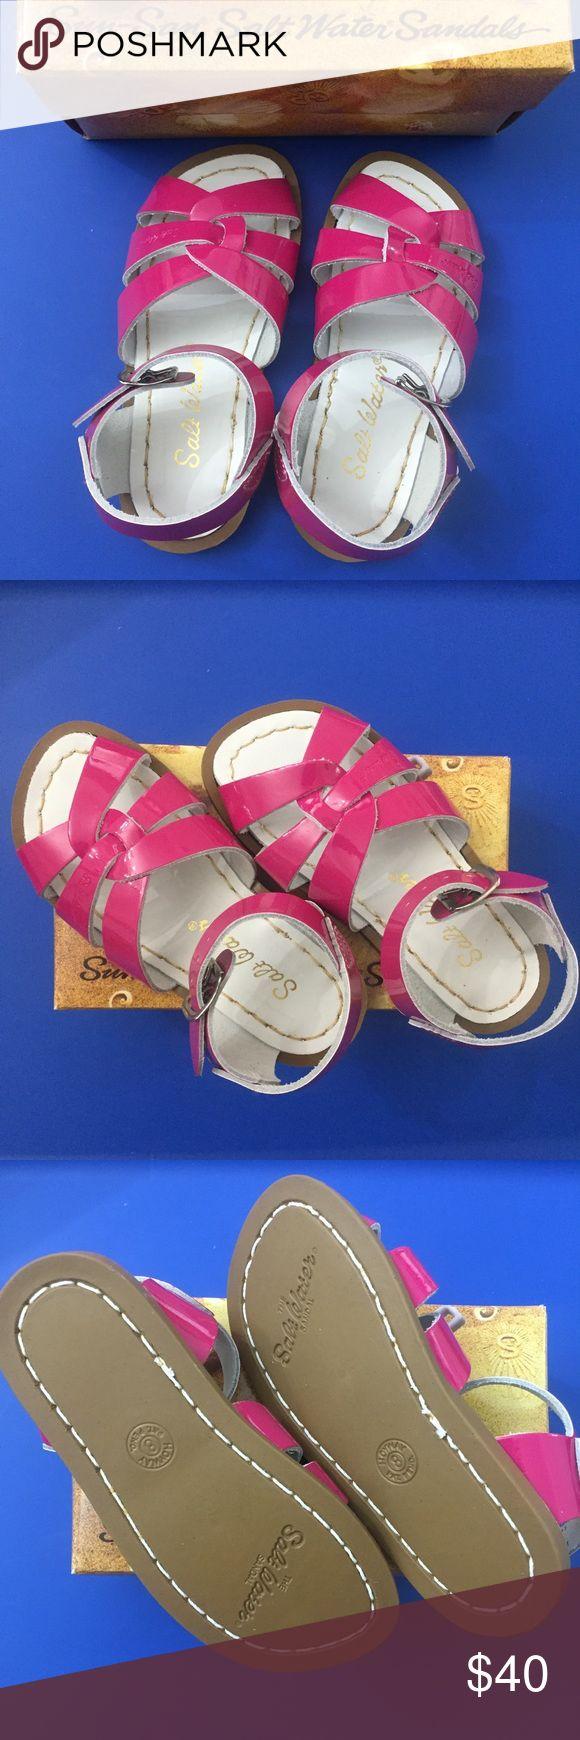 NIB Salt Water Sandals, Shiny Fuchsia, 8 NIB Salt Water Sandals, Shiny Fuchsia, 8 Salt Water Sandals by Hoy Shoes Sandals & Flip Flops